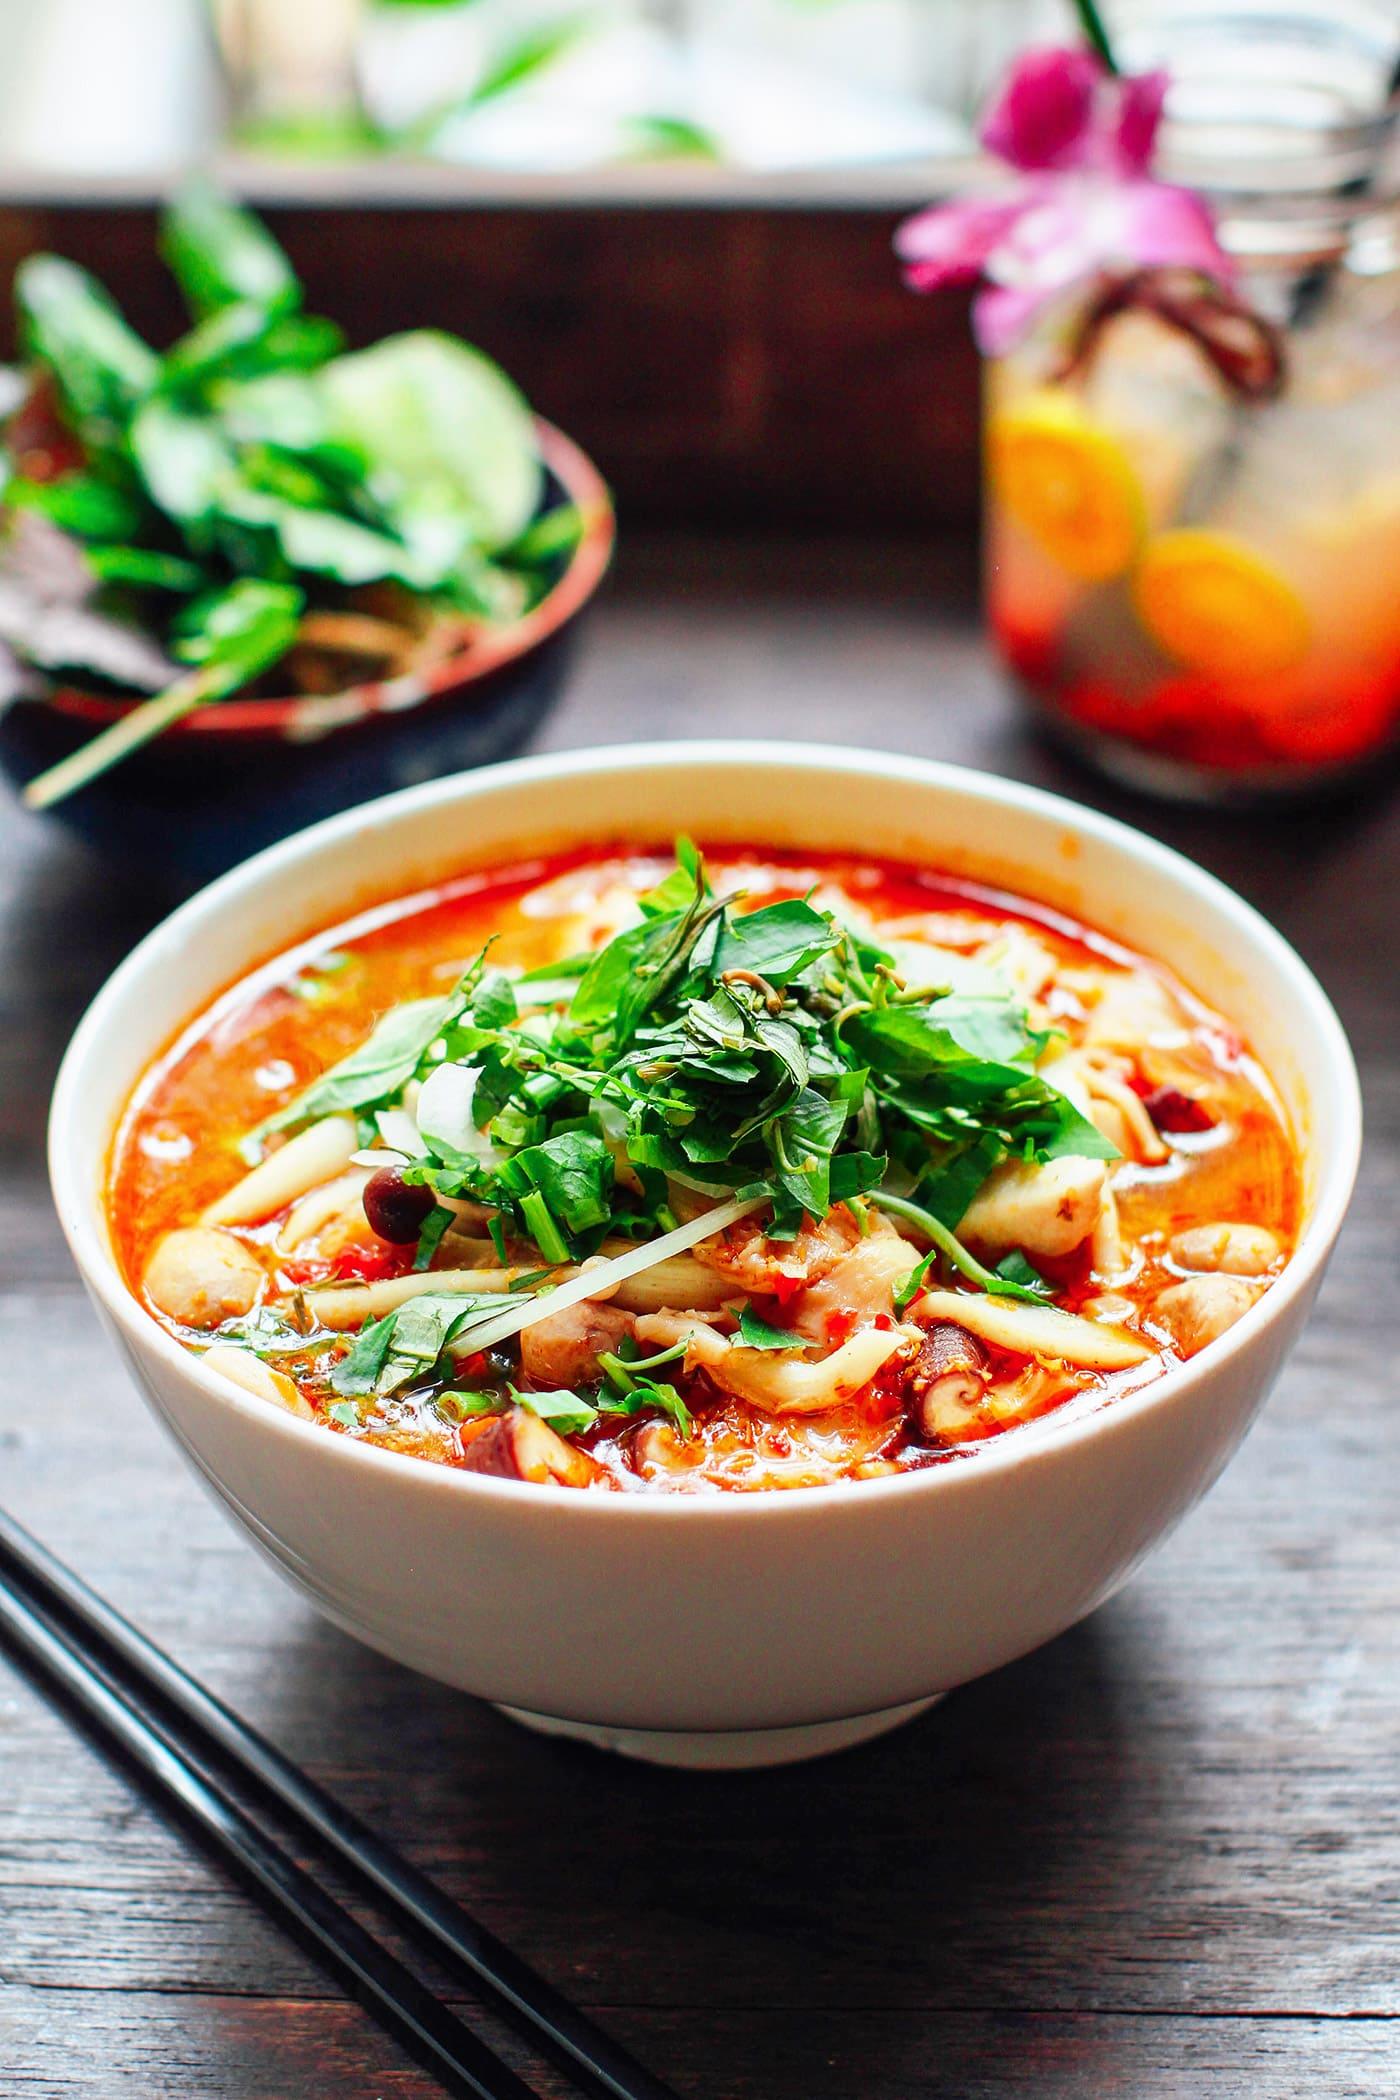 A Guide to Eating Vegan in Viet Nam - Bun Bo Hue